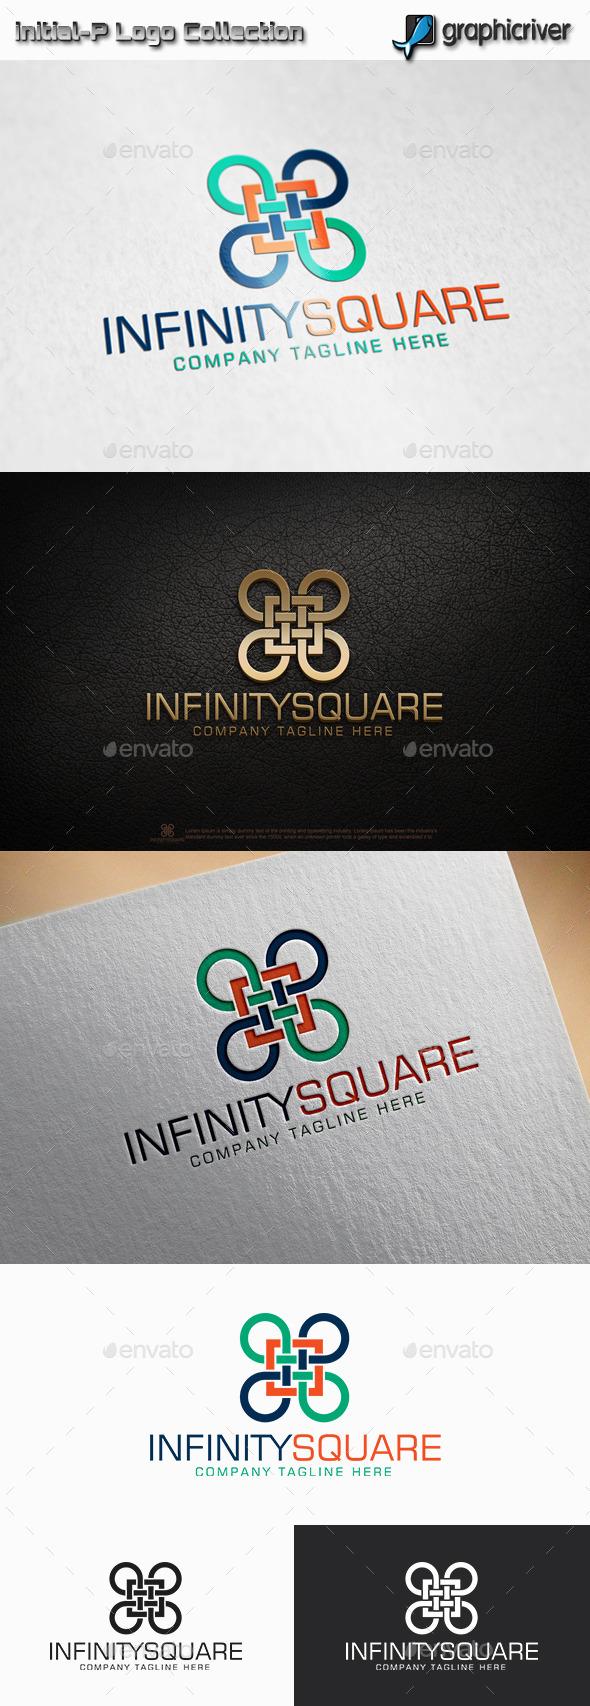 GraphicRiver Infinity square logo 11775137